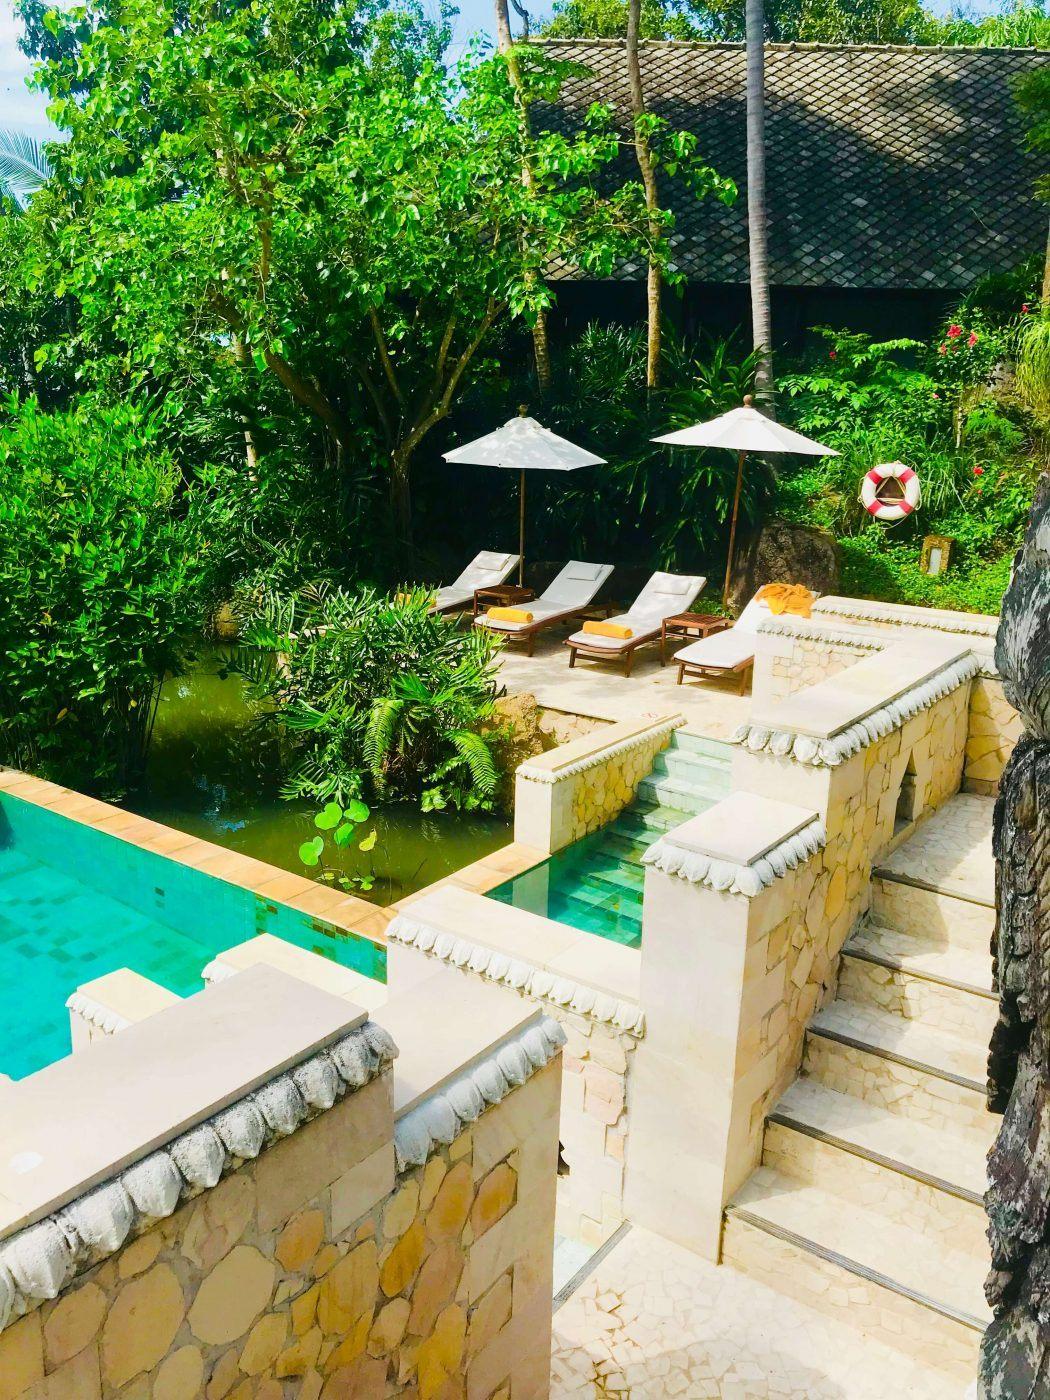 kamalaya pool with lounge chairs and umbrellas